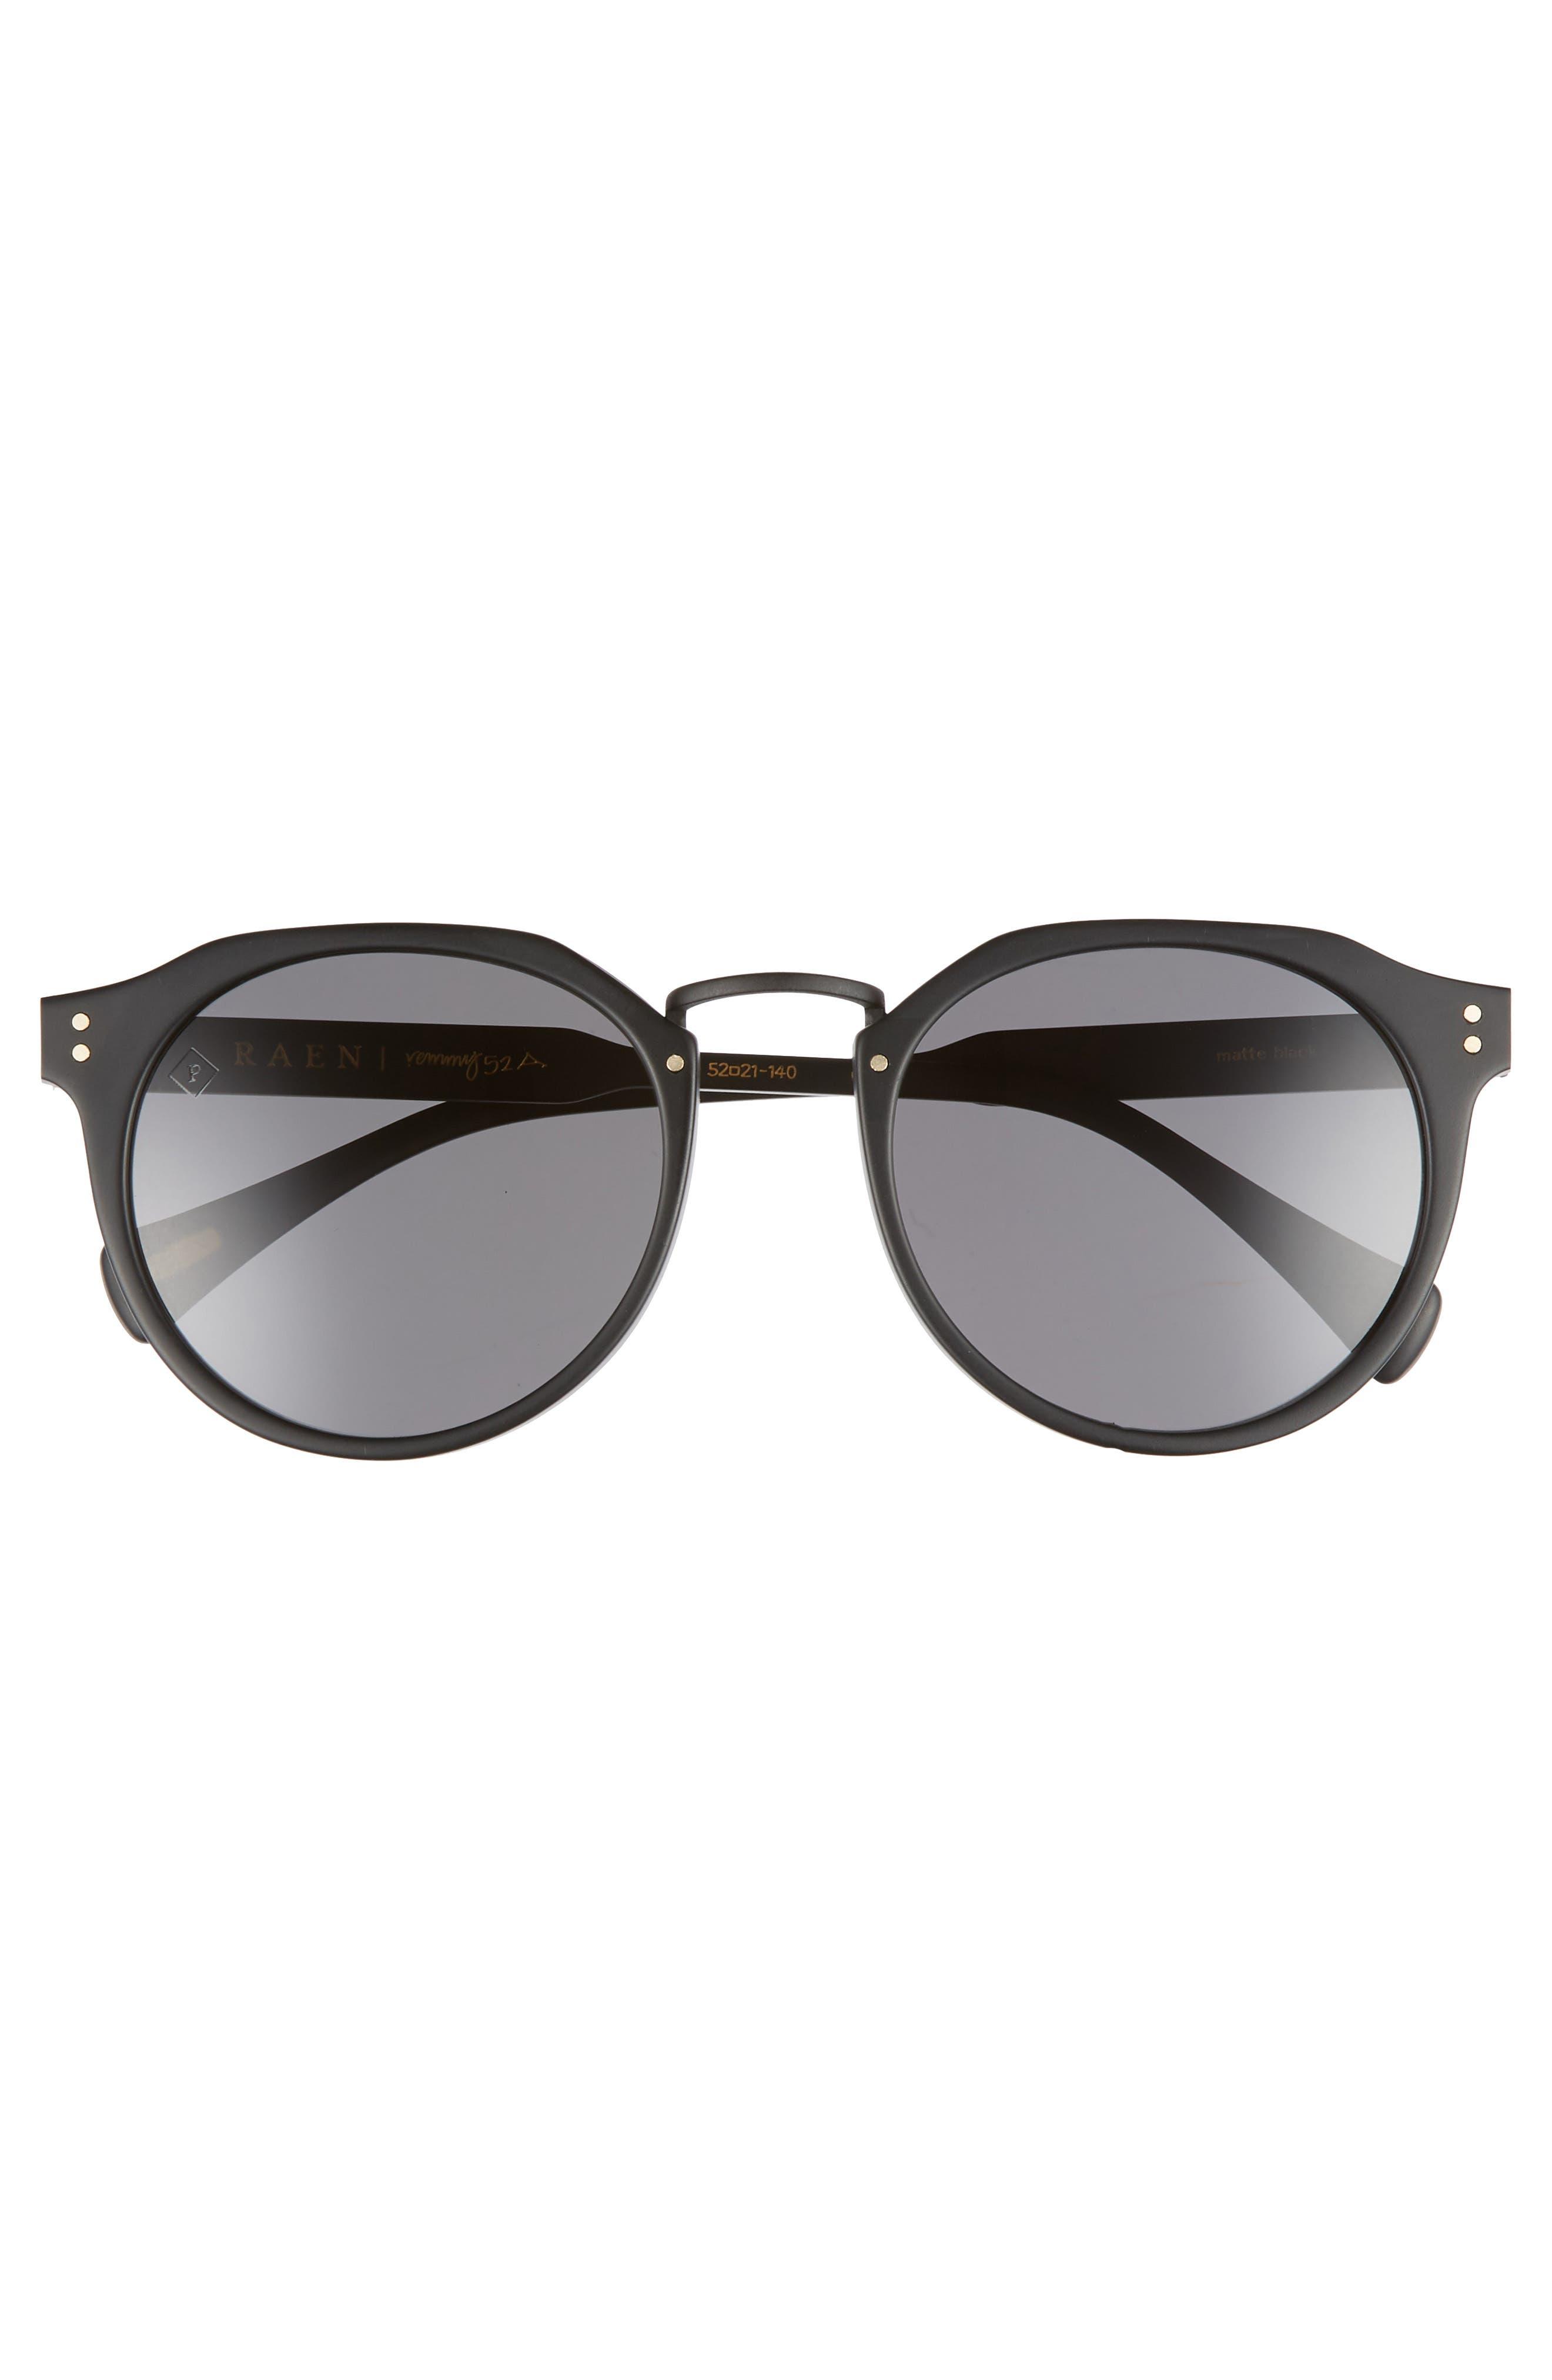 Remmy 52mm Sunglasses,                             Alternate thumbnail 2, color,                             Kola Tortoise